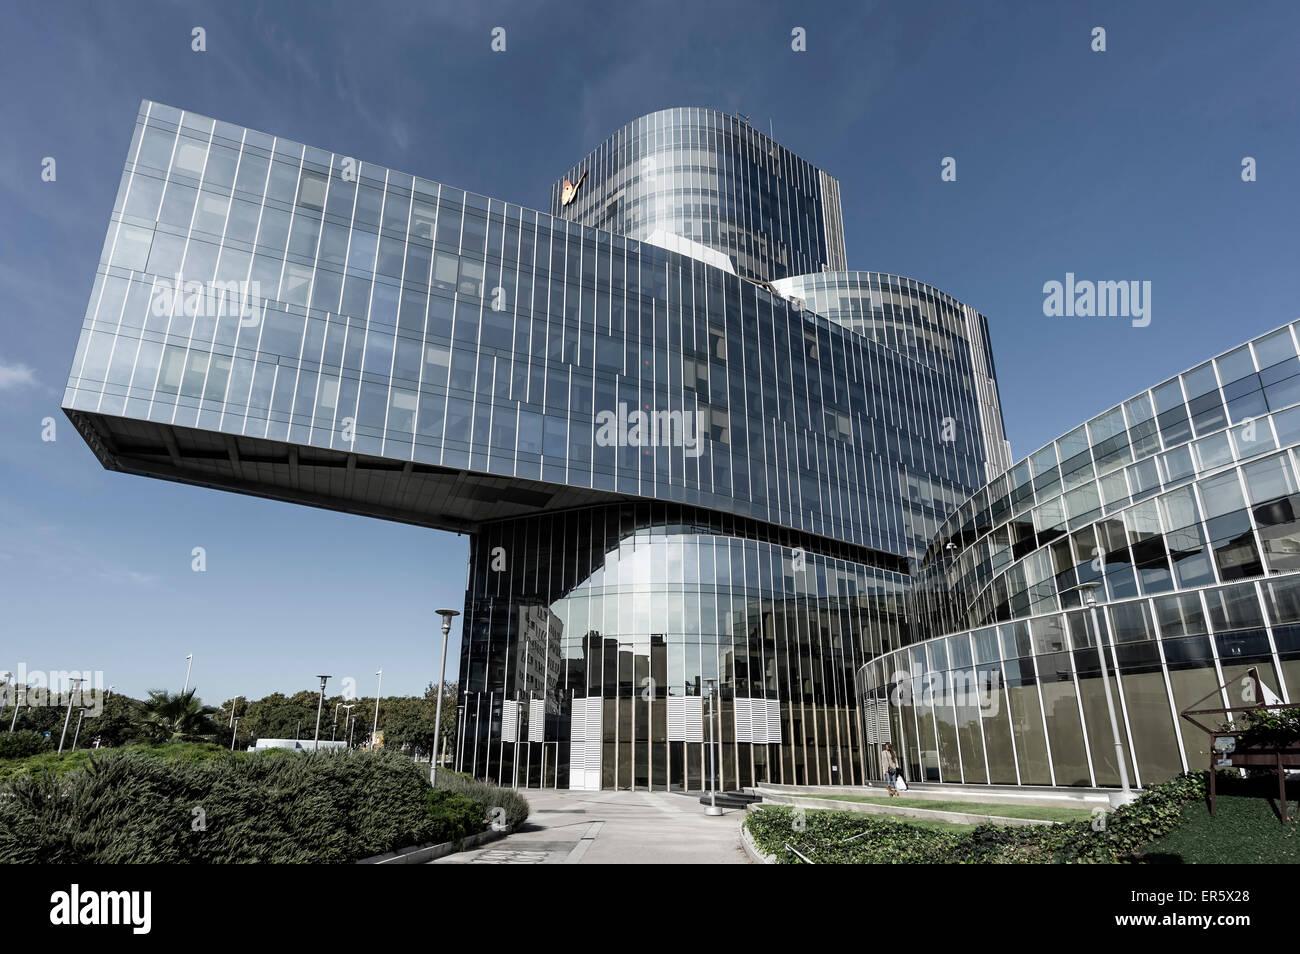 Modern Architecture Barcelona spain, catalonia, barcelona, torre mare nostrum, modern